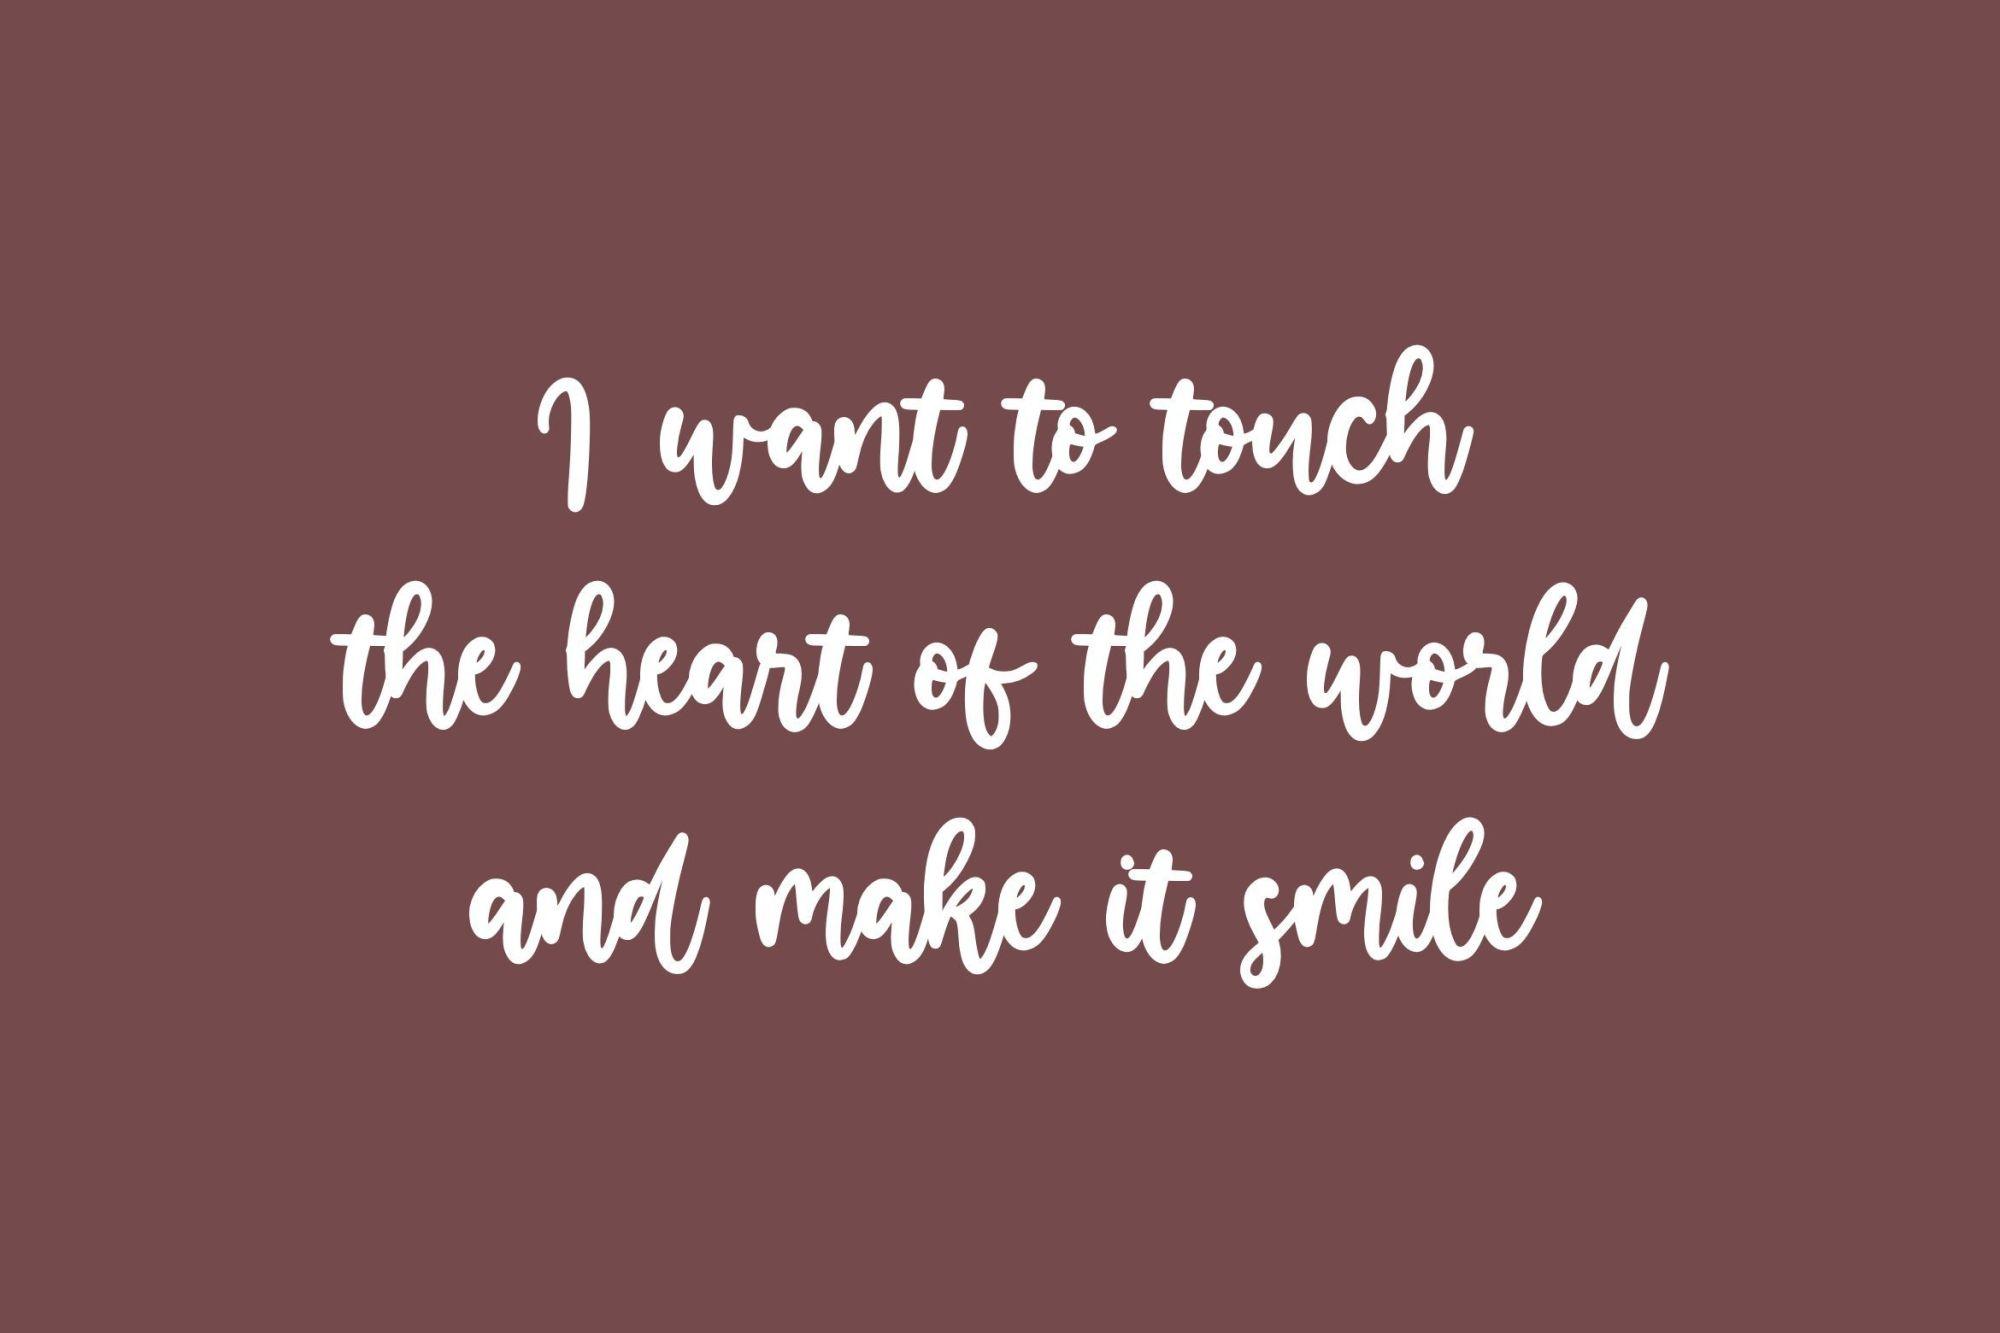 Smilestar-Bold-Handwritten-Font-2